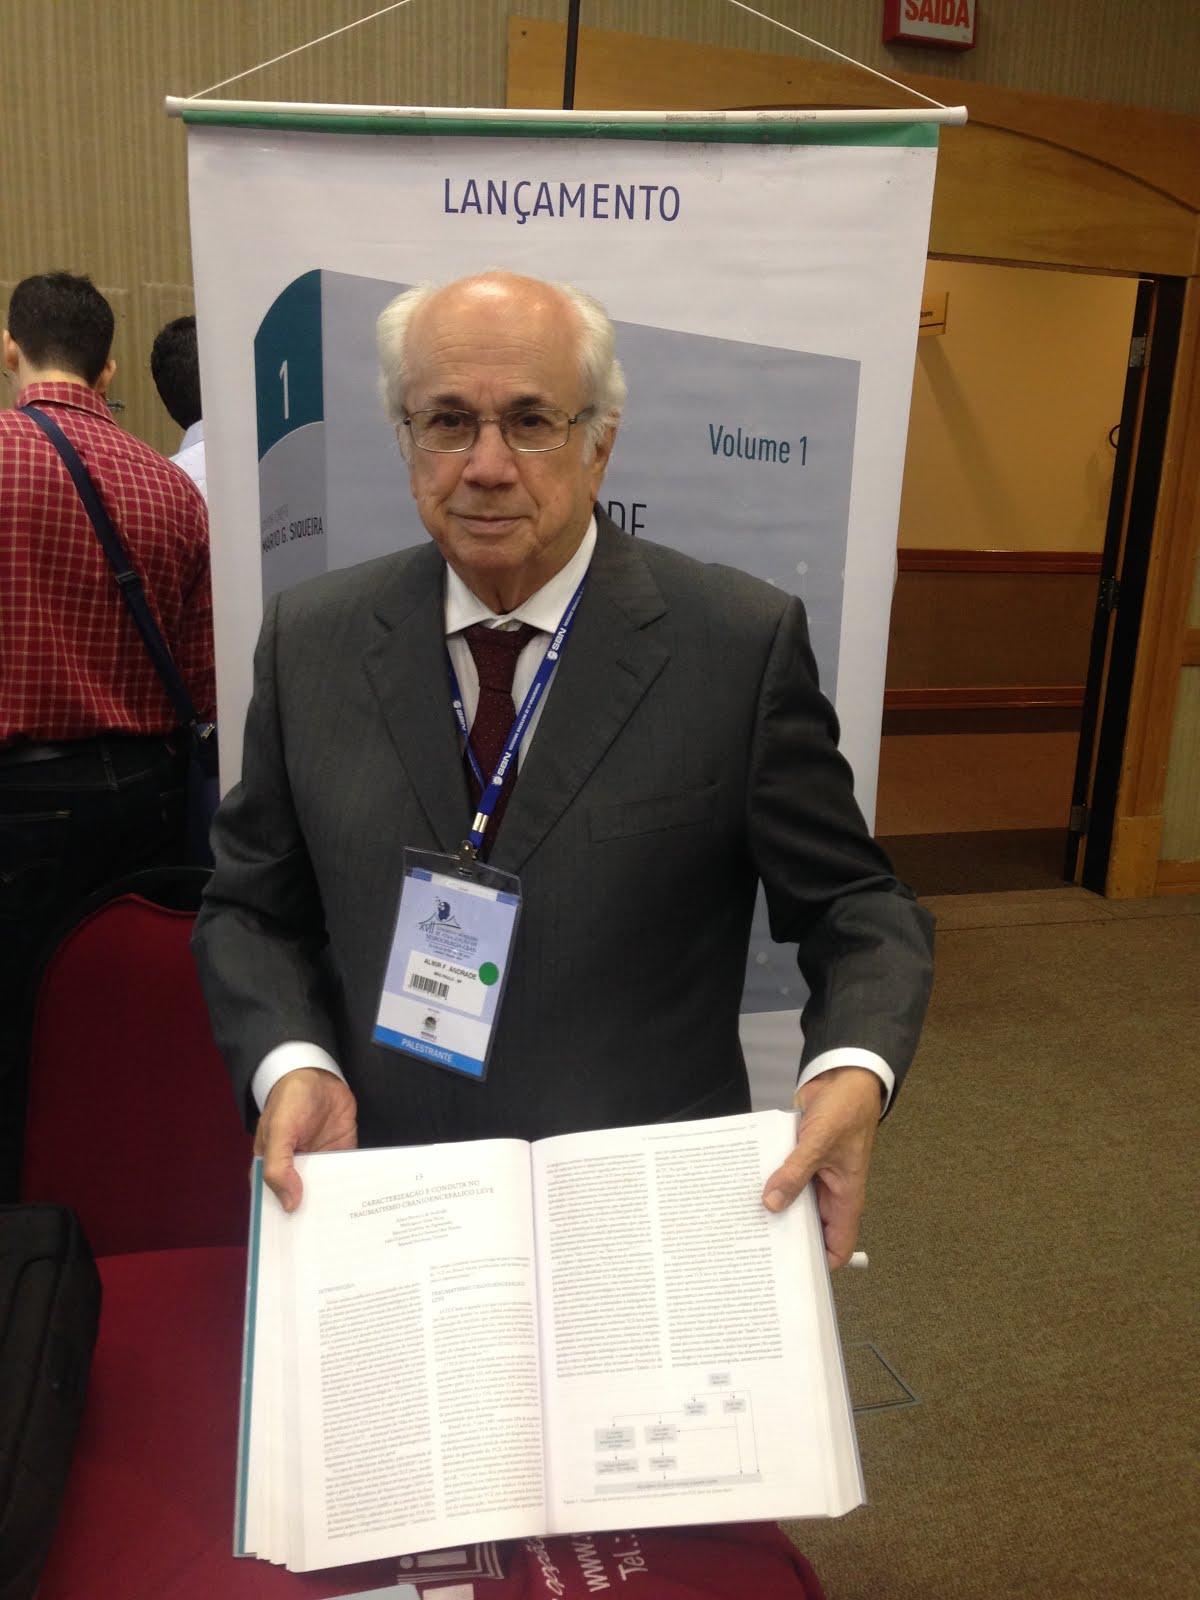 Prof. Almir Ferreira de Andrade